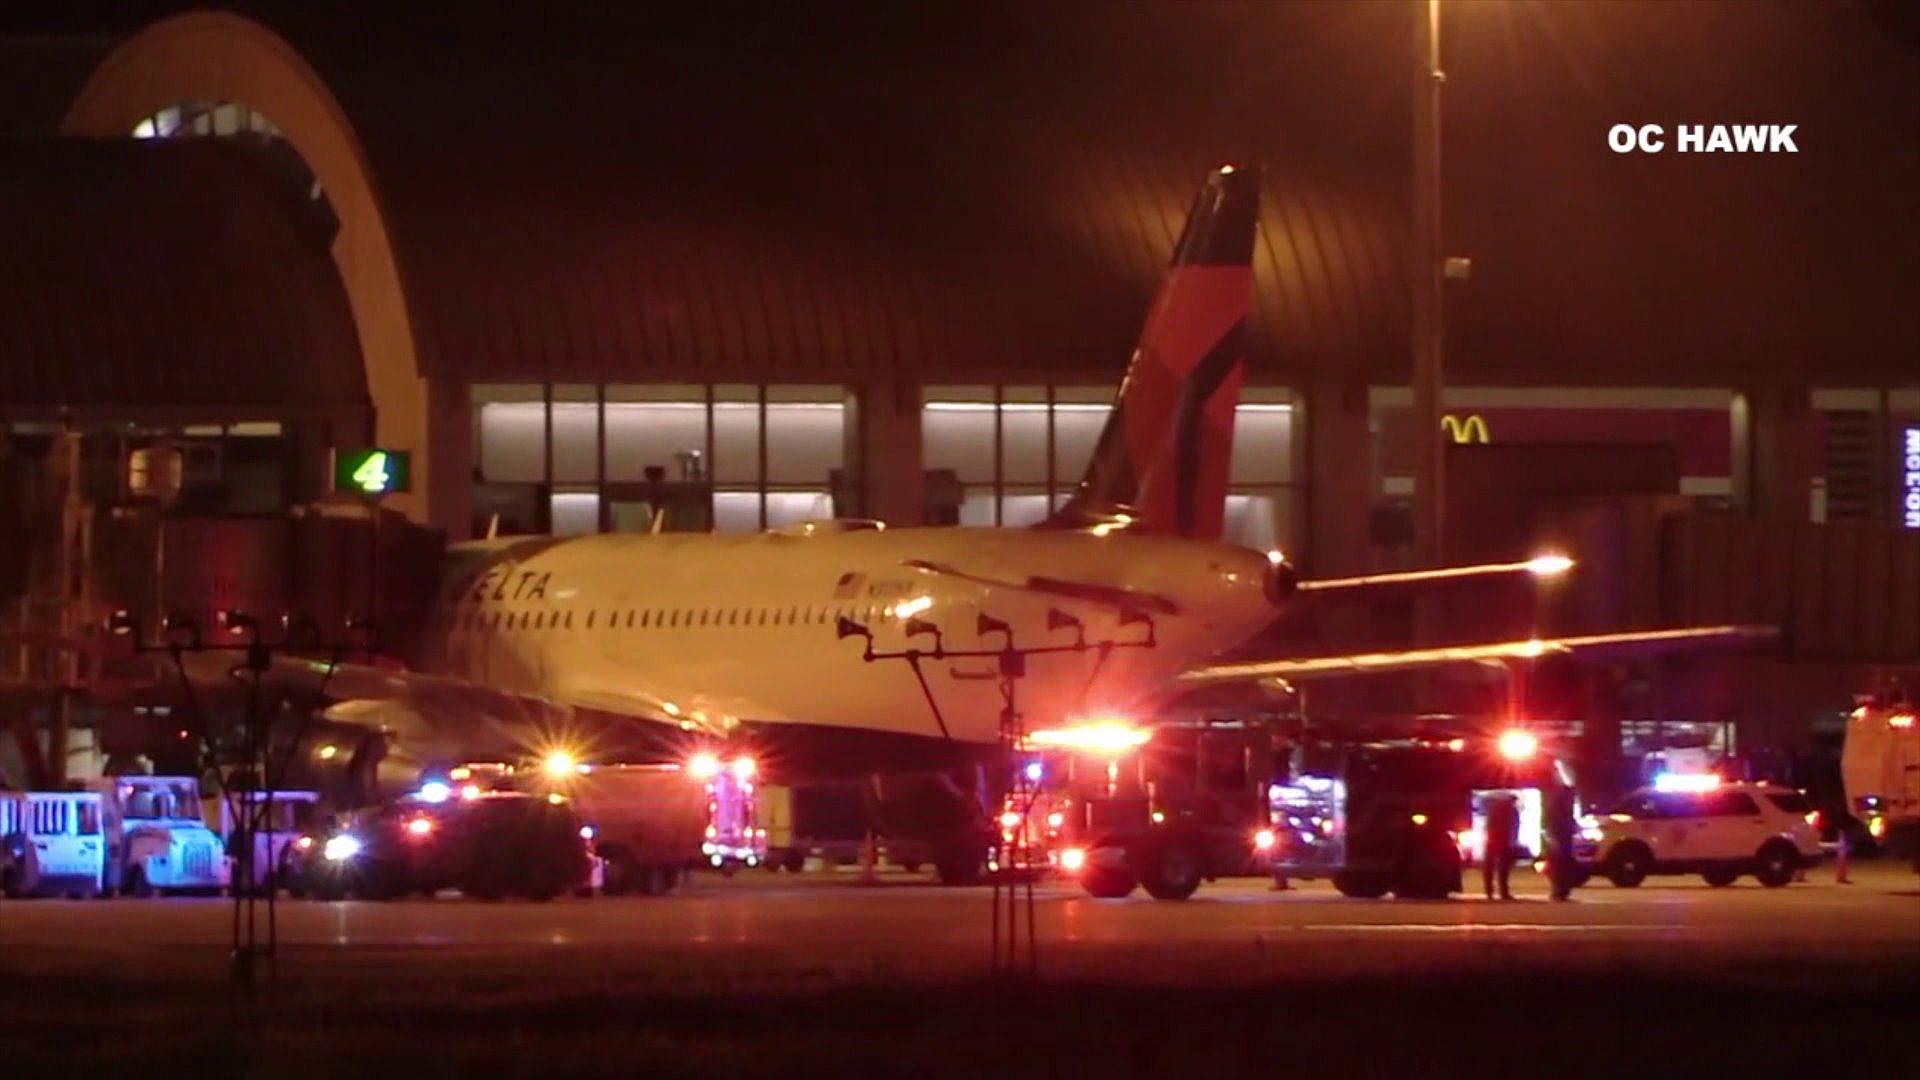 Emergency crews at John Wayne Airport respond on Feb. 19, 2019. (Credit: OC Hawk)